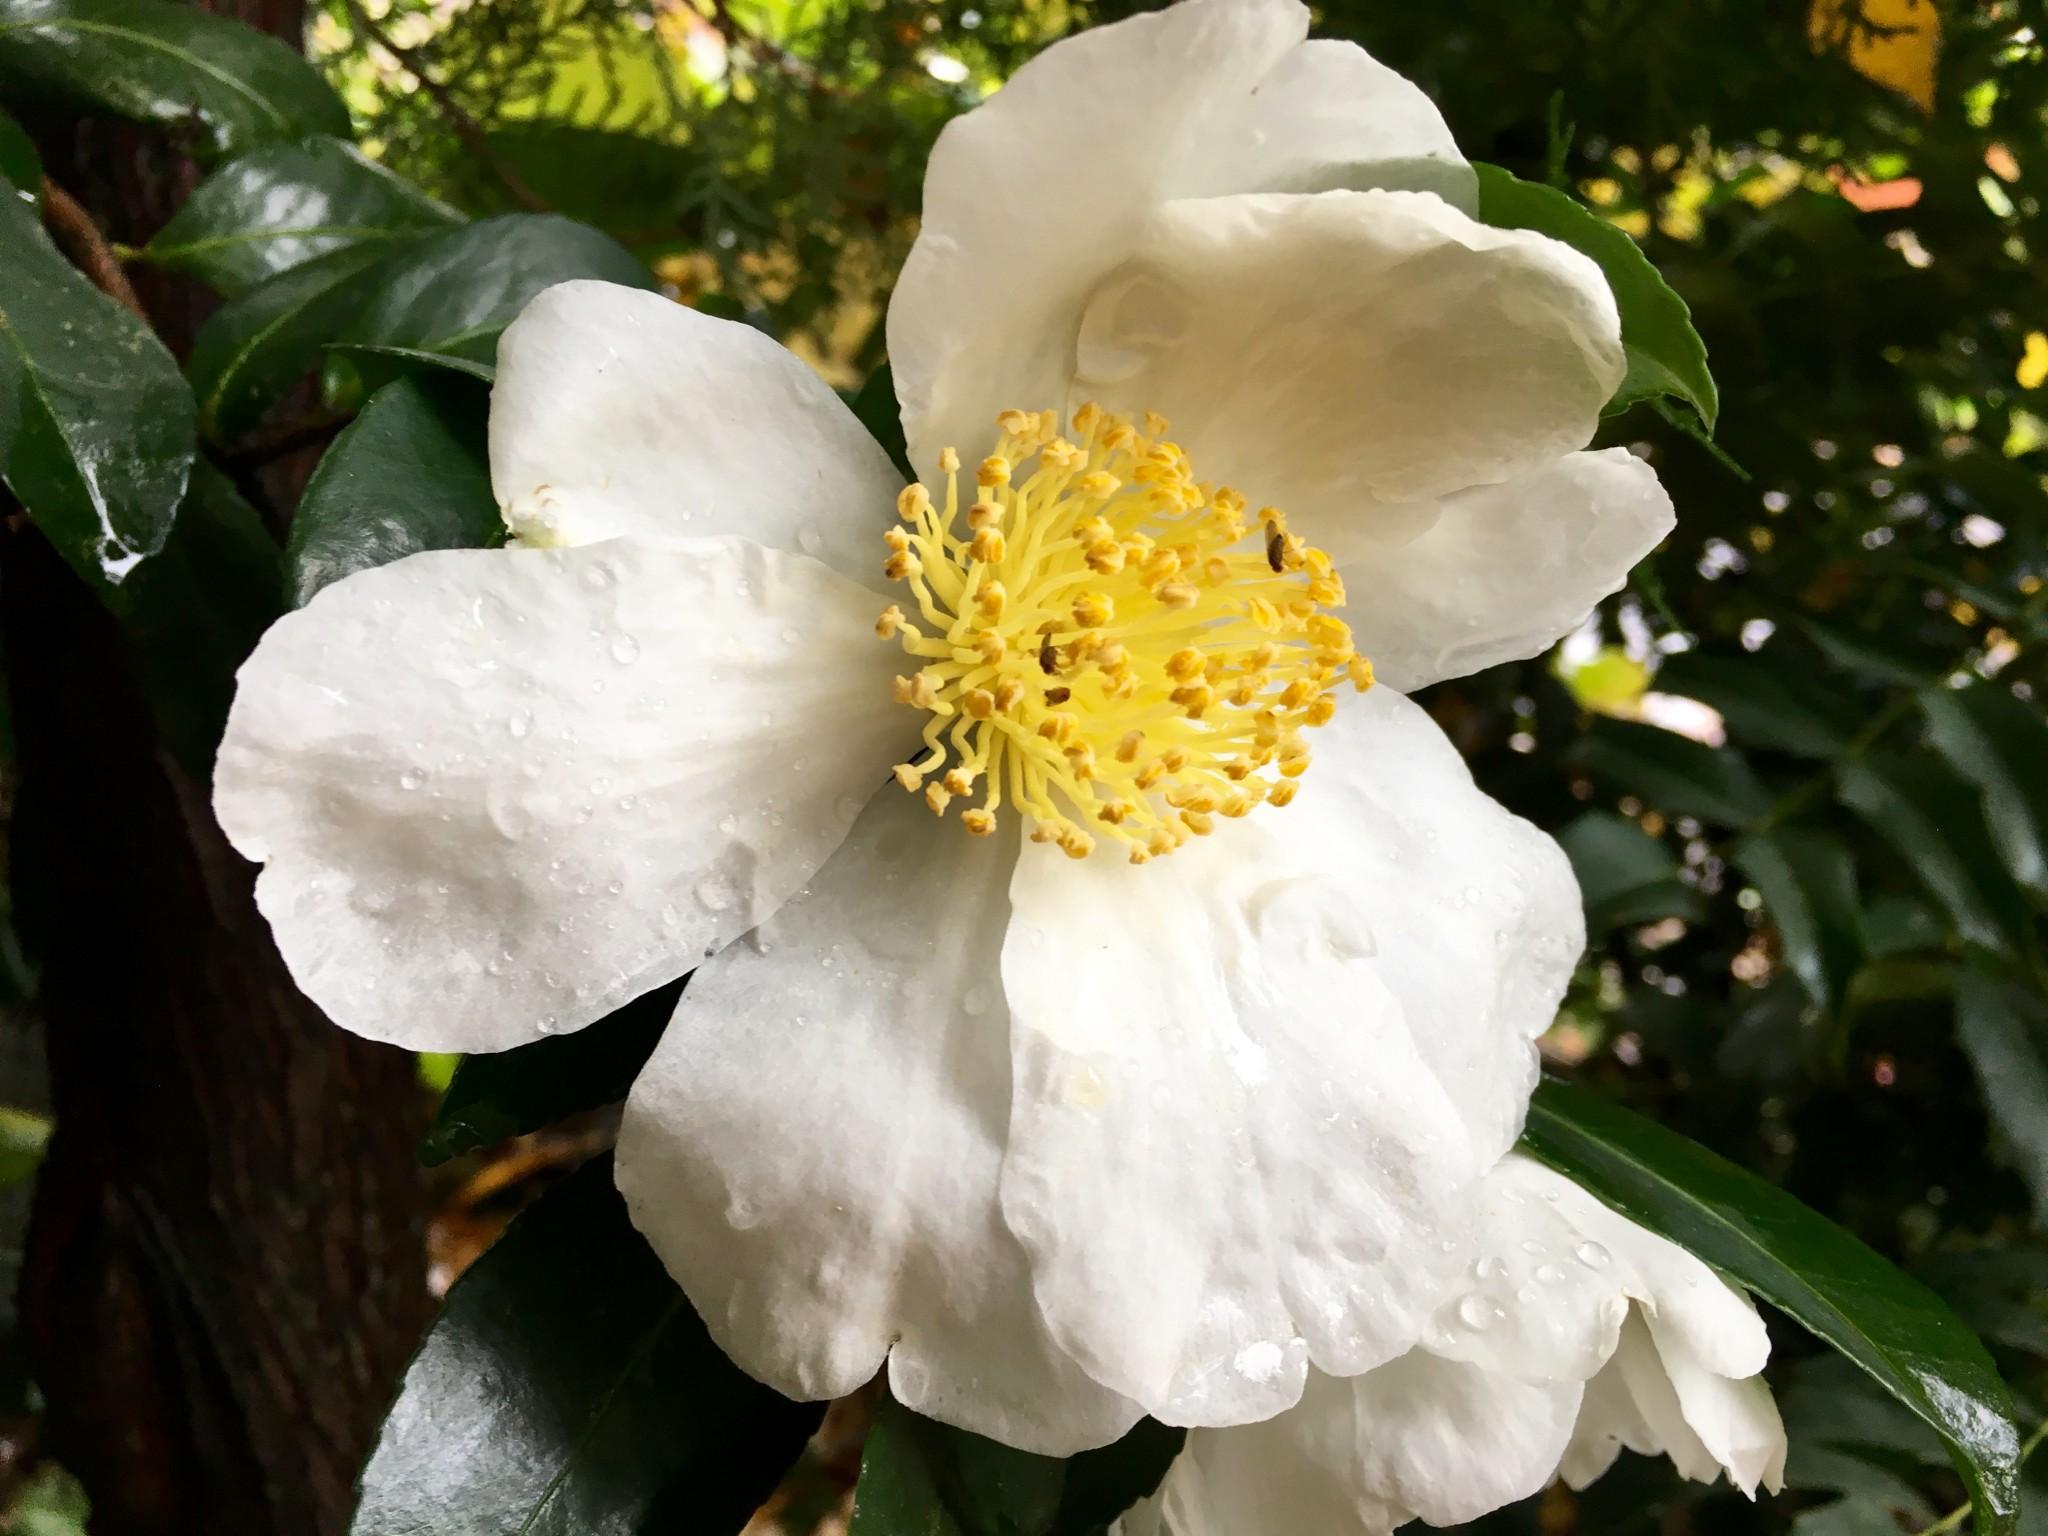 White Camellia that mimics the look of Romneya coulteri aka Matilija Poppy.